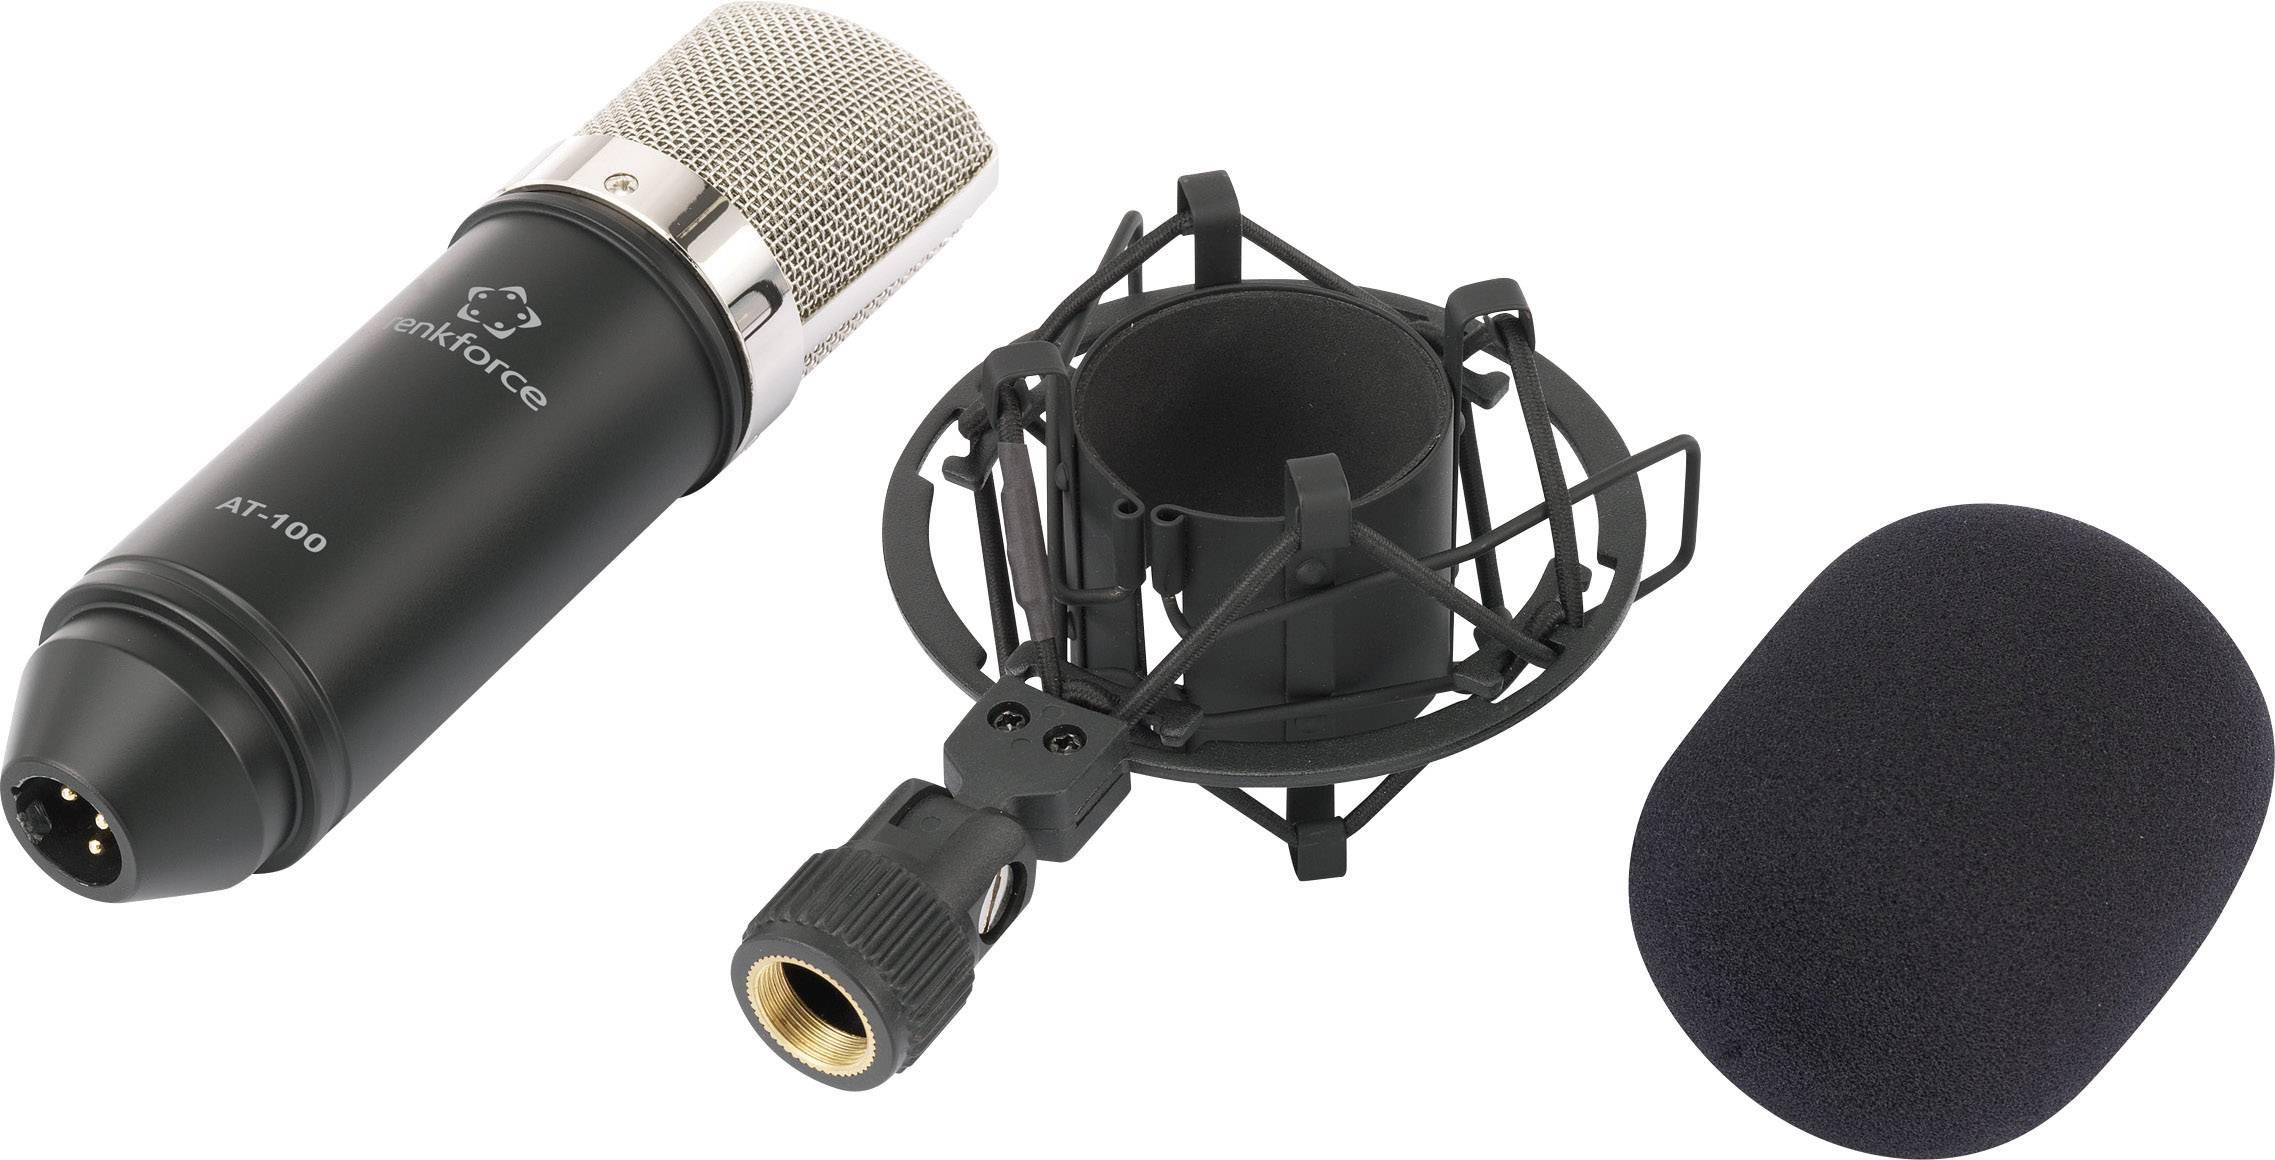 kondensatormikrofon tilslutning